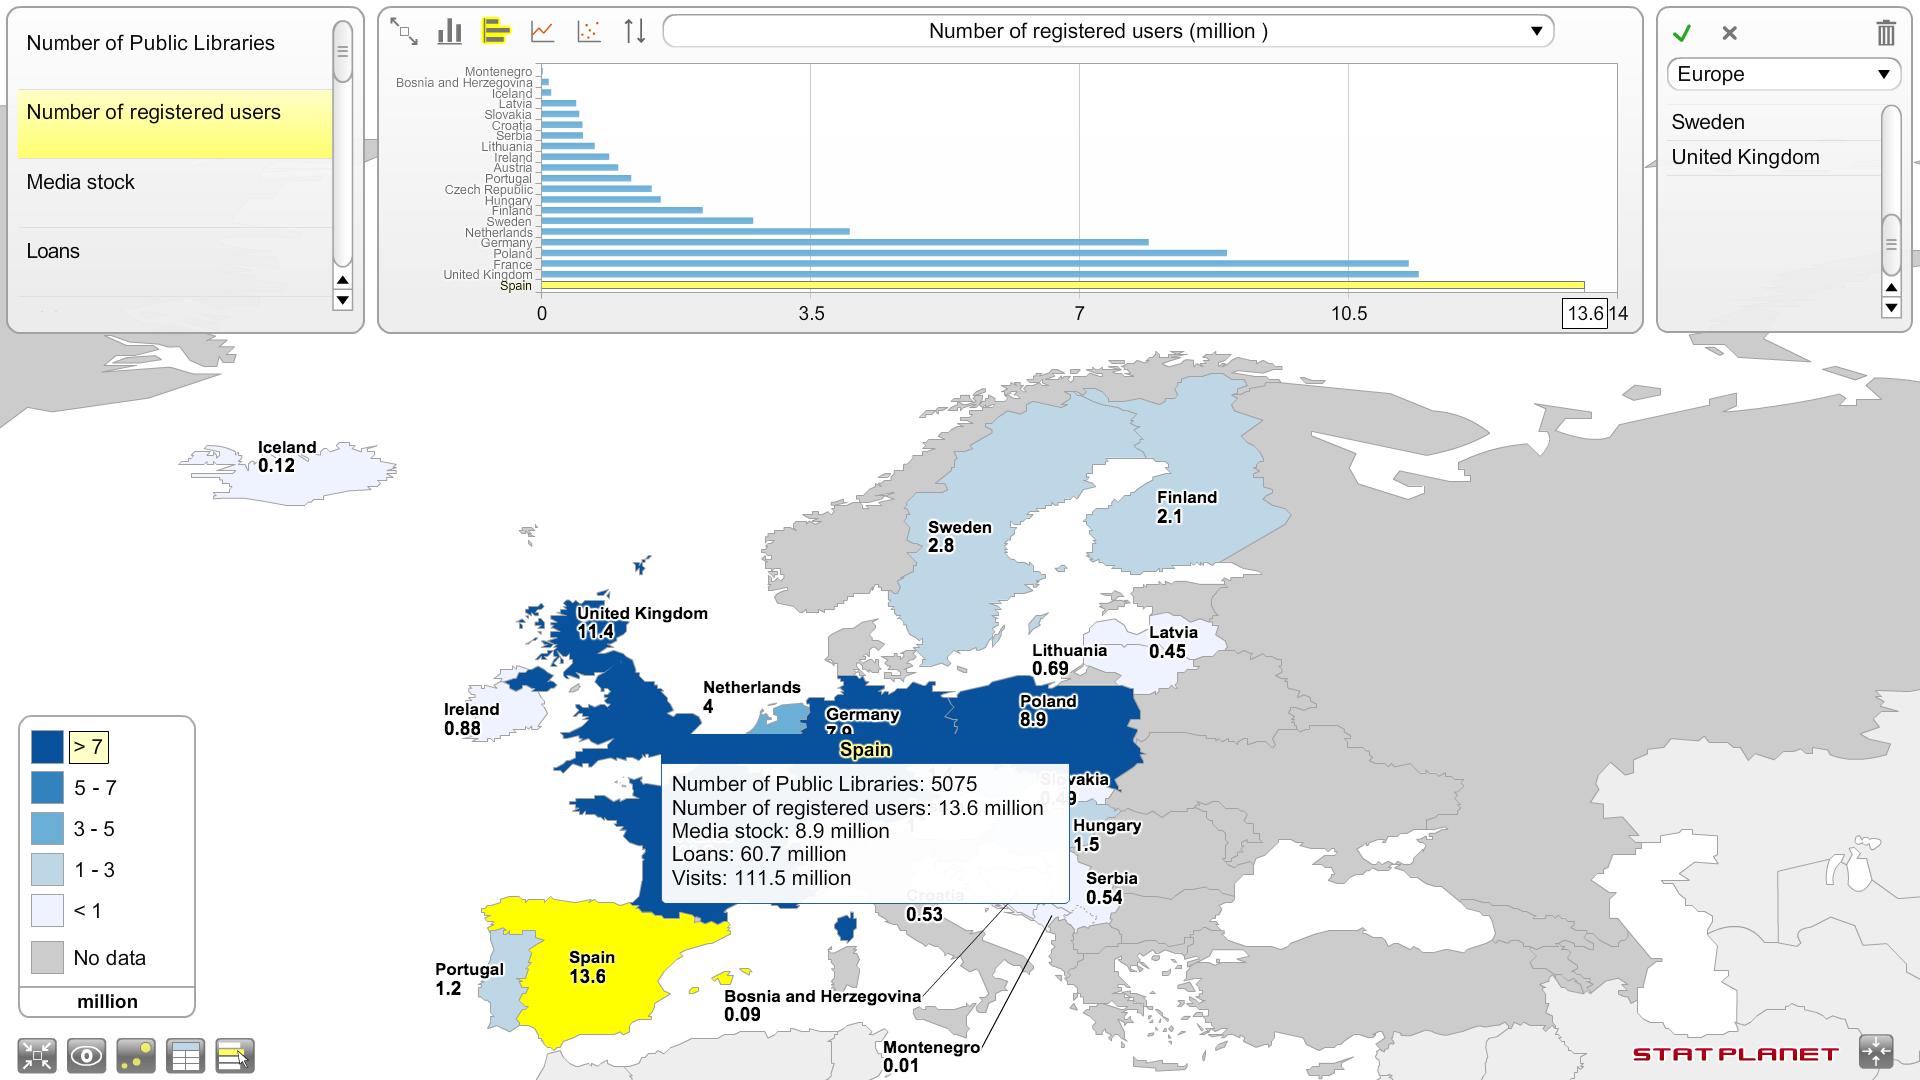 España en cabeza en número de socios  de bibliotecas públicas